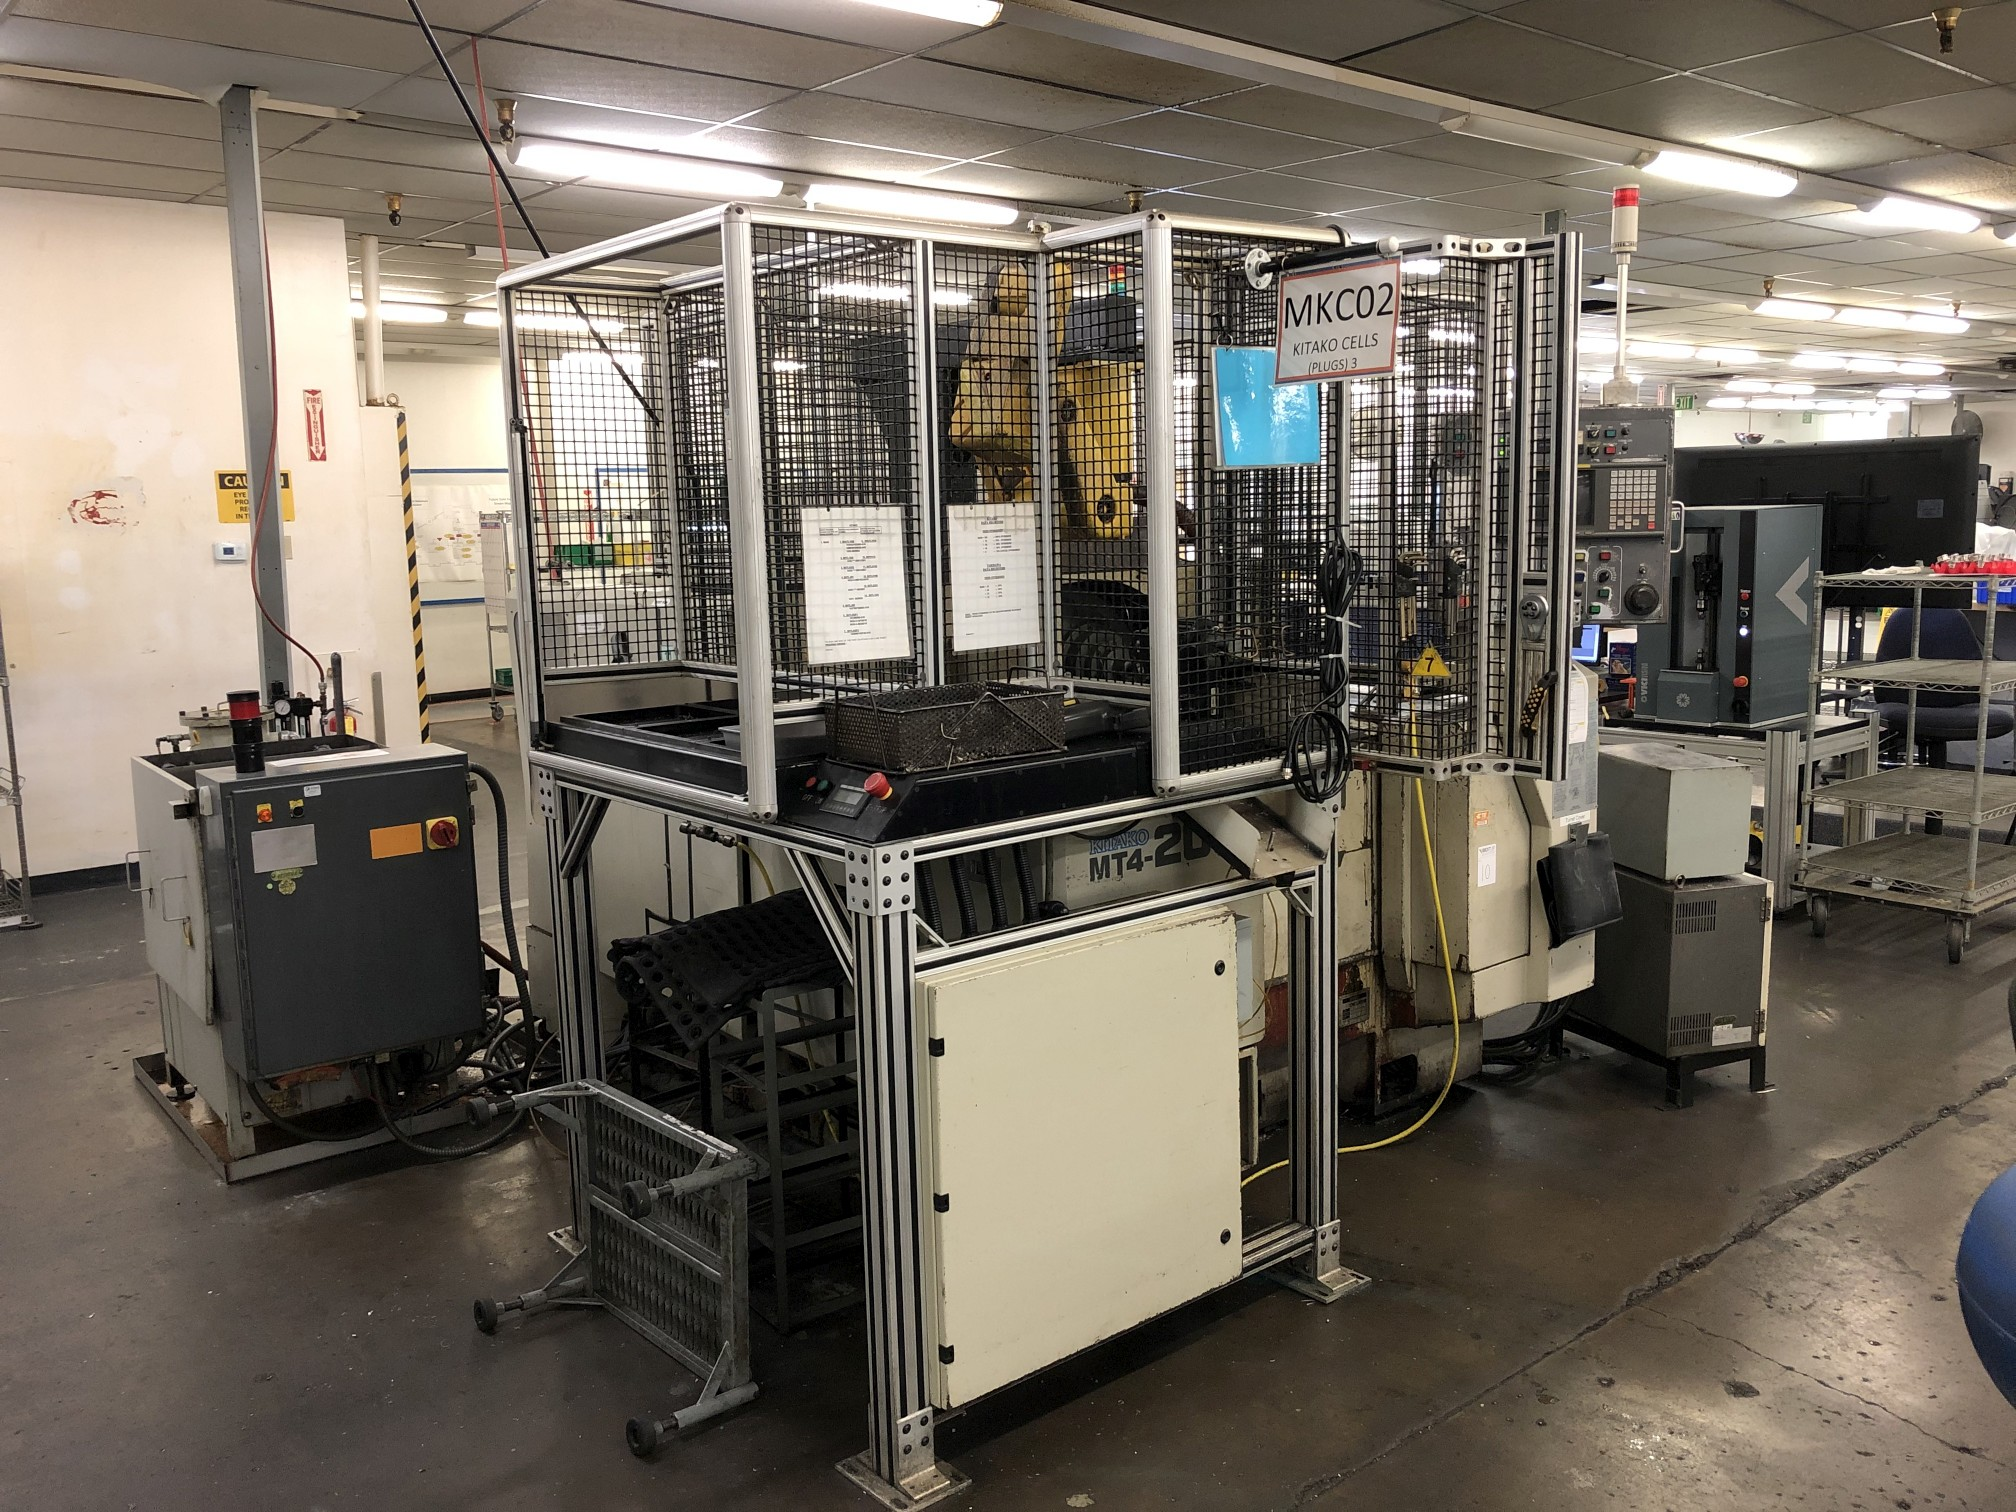 1999 Kitako MT4-200 Multi-Spindle CNC Turning Mill - Image 15 of 16